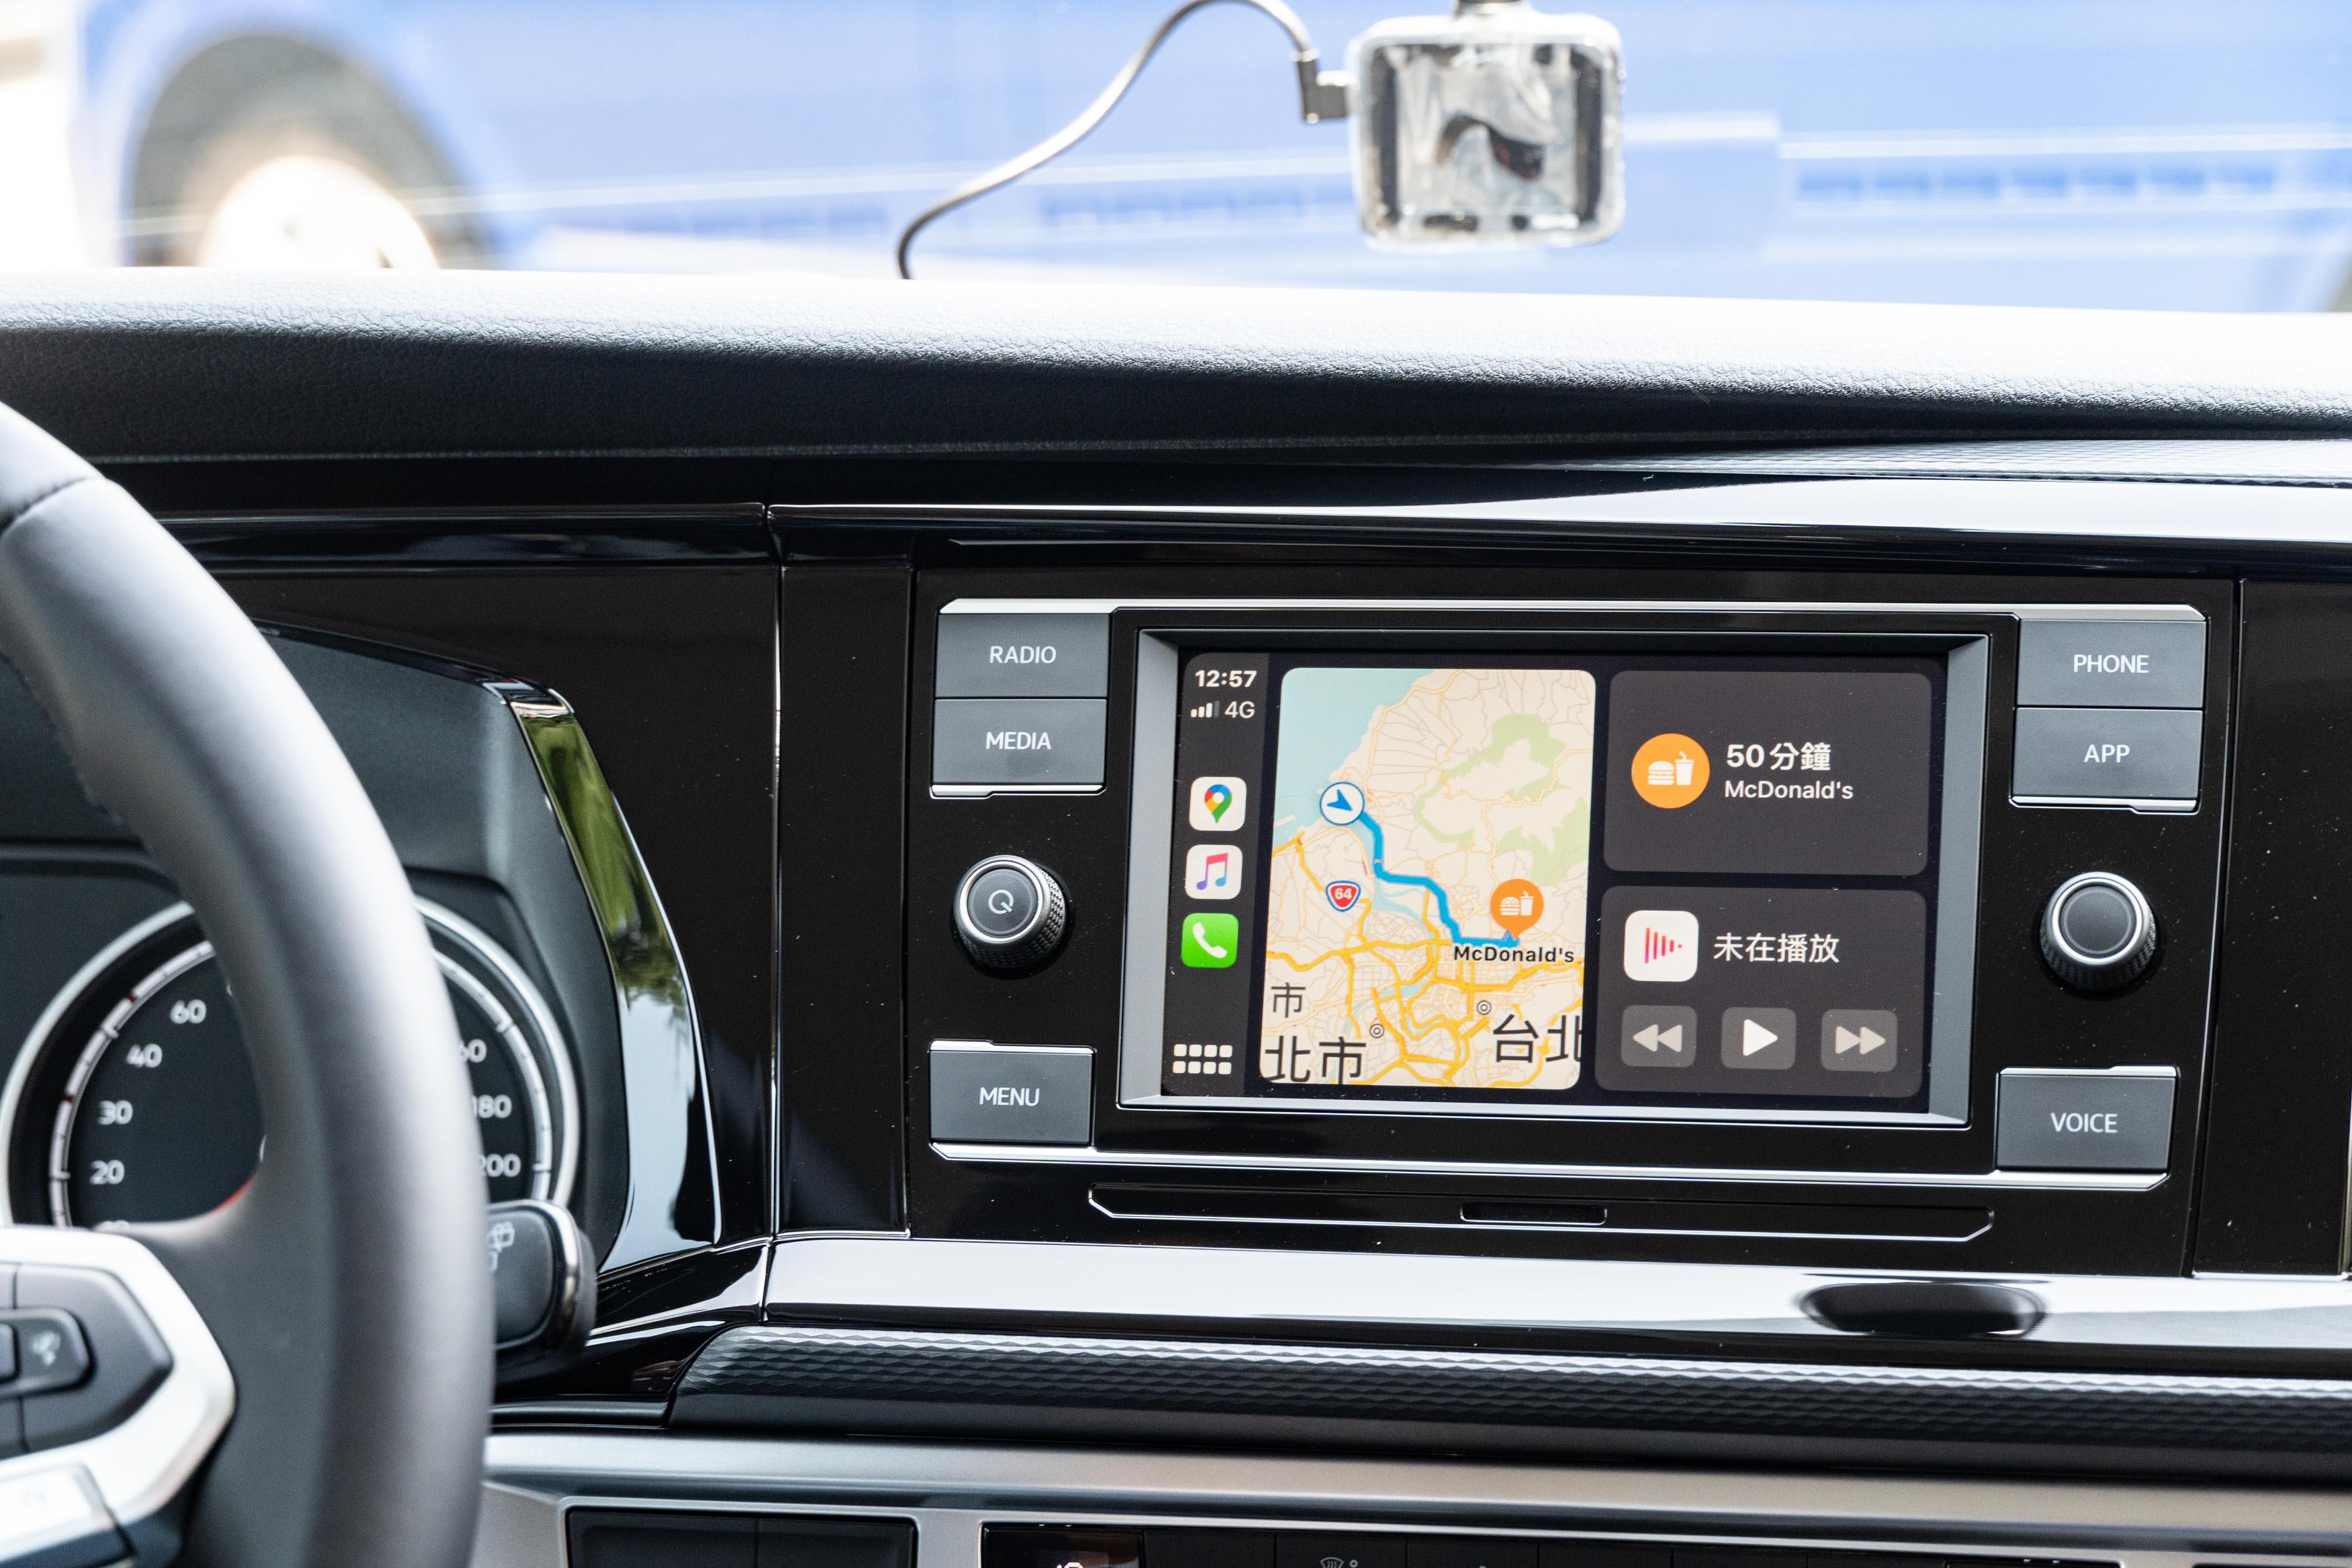 6.5 吋彩色中央觸控螢幕支援 Apple CarPlay 和 Android Auto。